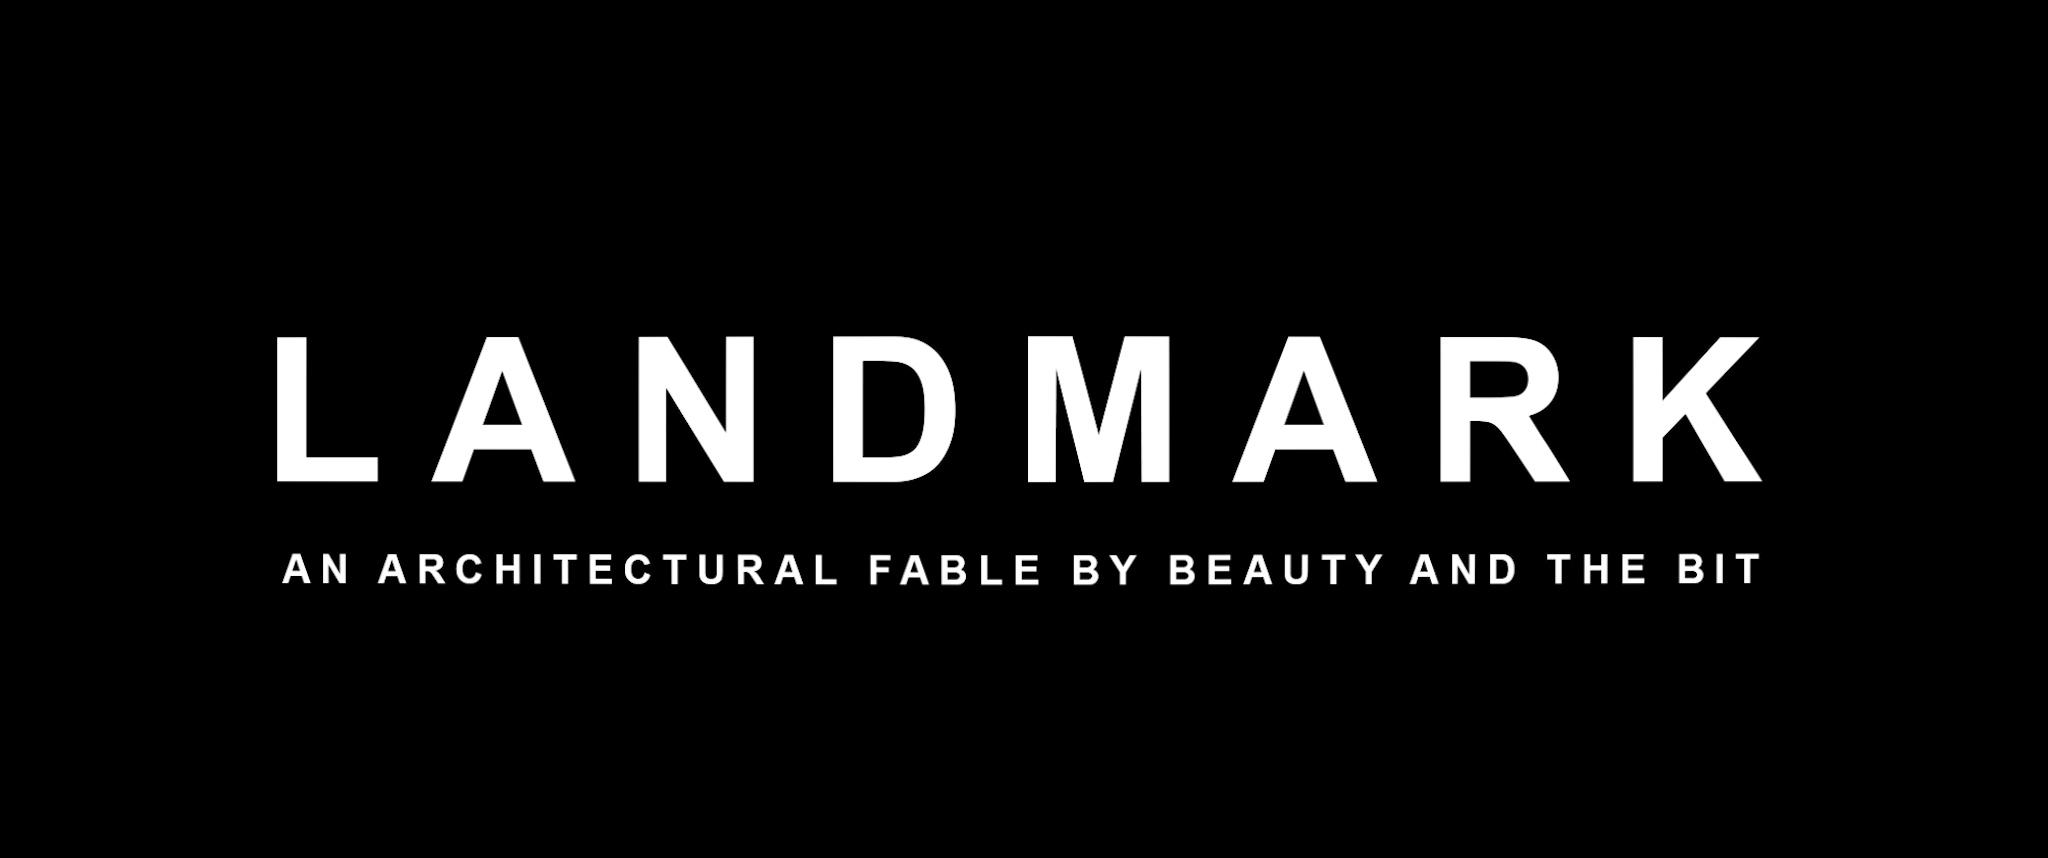 LANDMARK, Beauty and The Bit